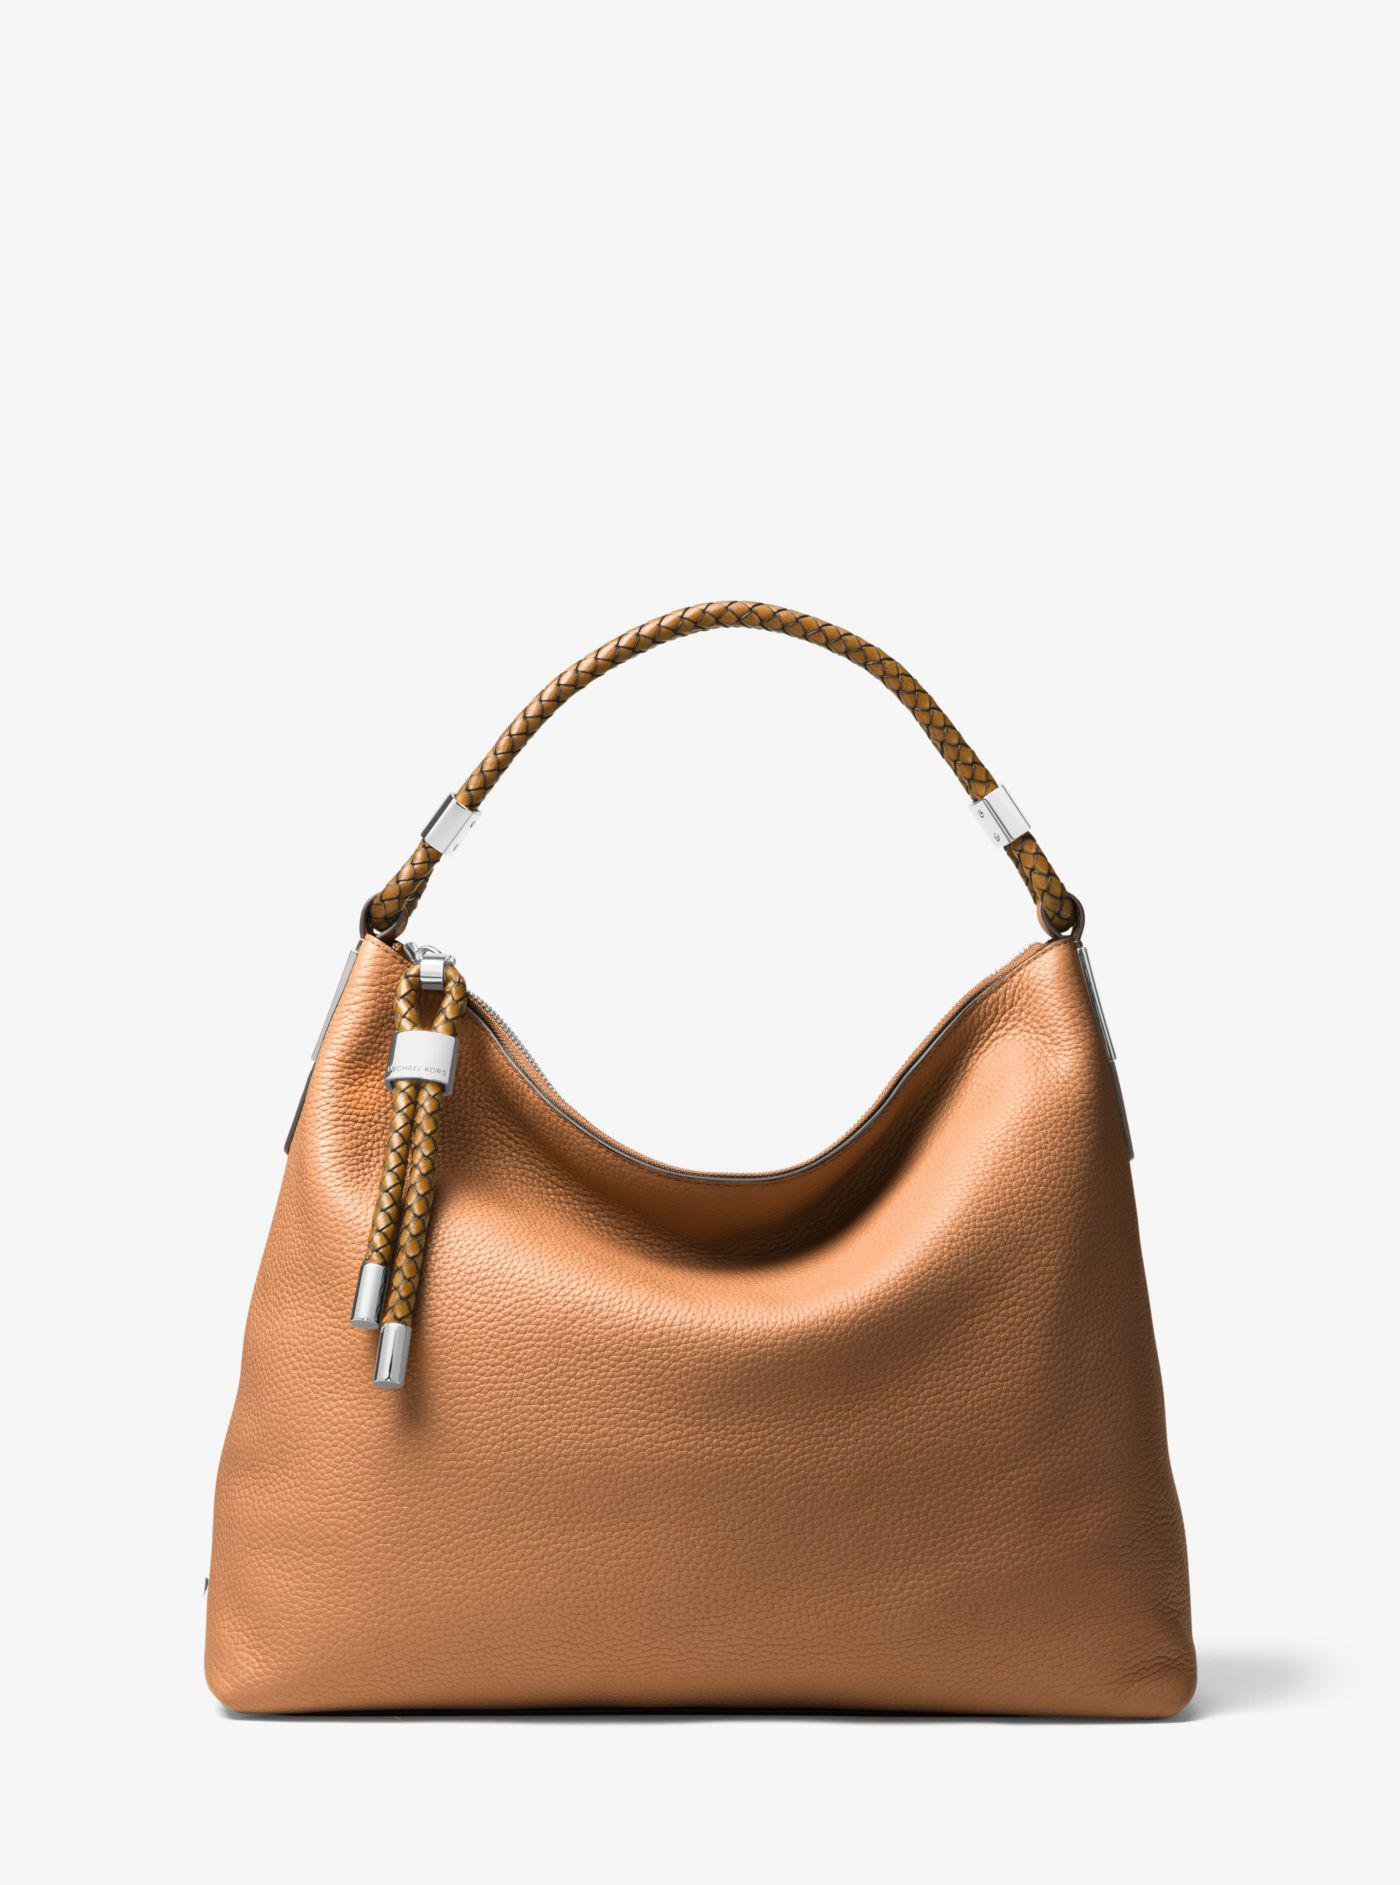 9ac44198f791 Lyst - Michael Kors Skorpios Large Pebbled Leather Shoulder Bag